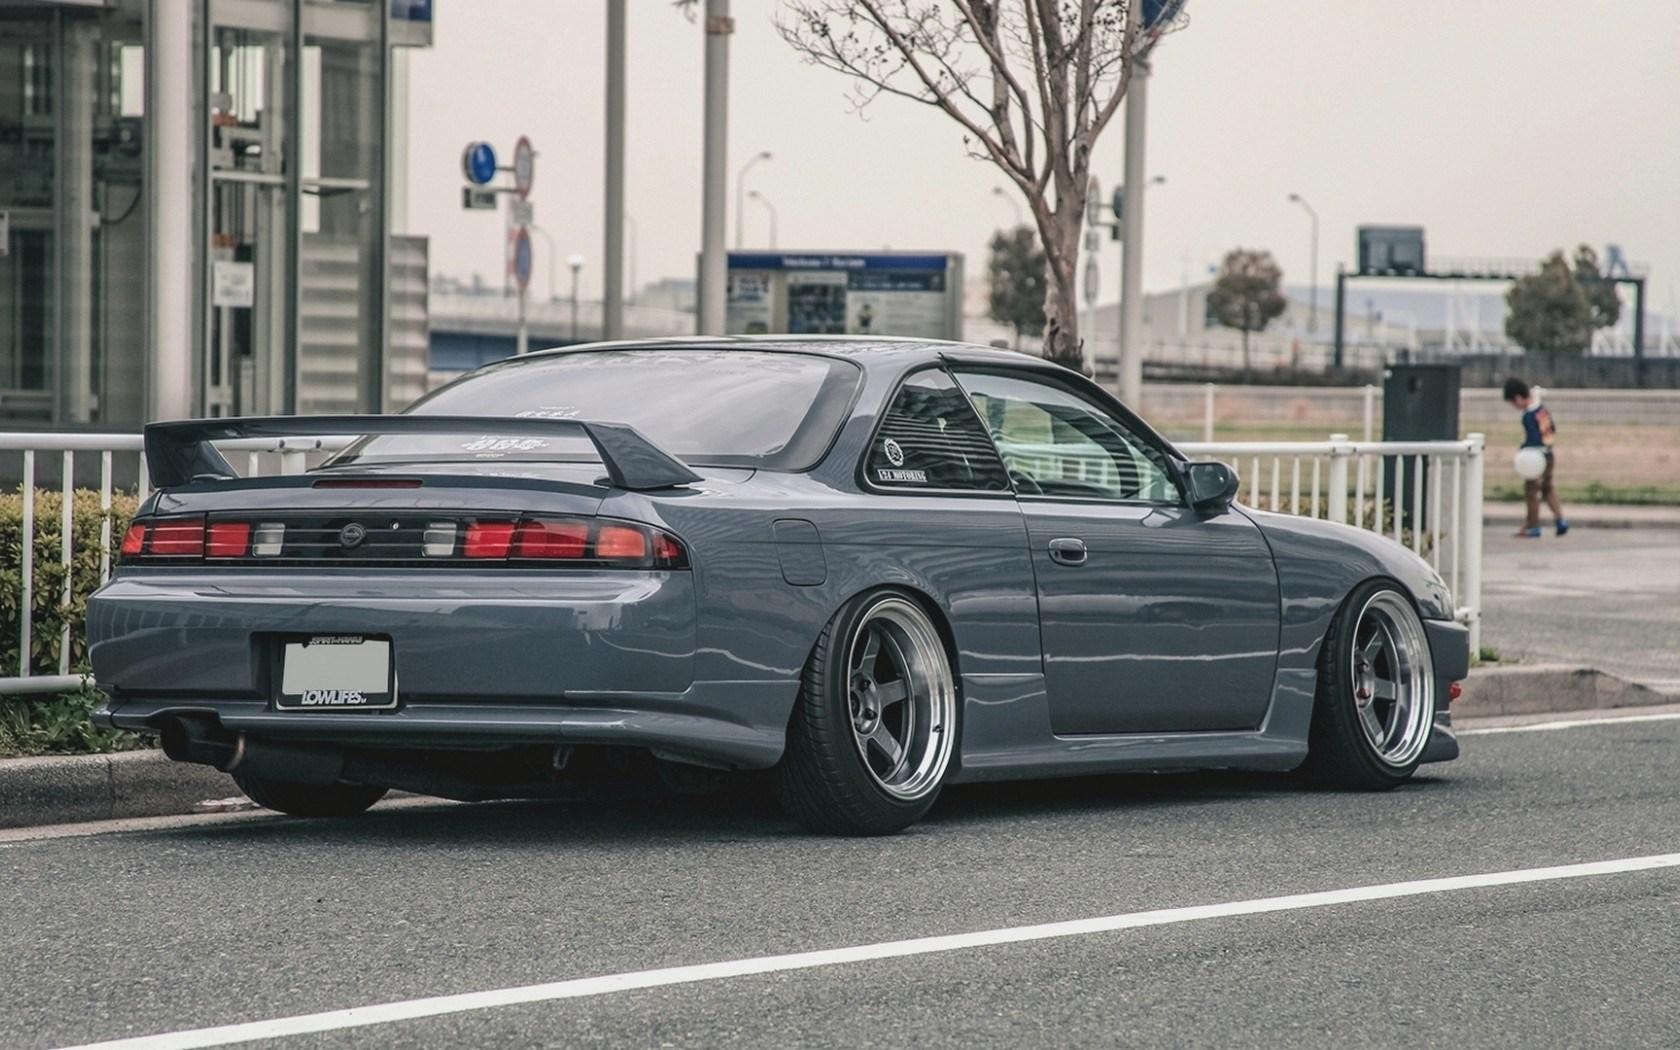 Nissan Silvia S14 Street